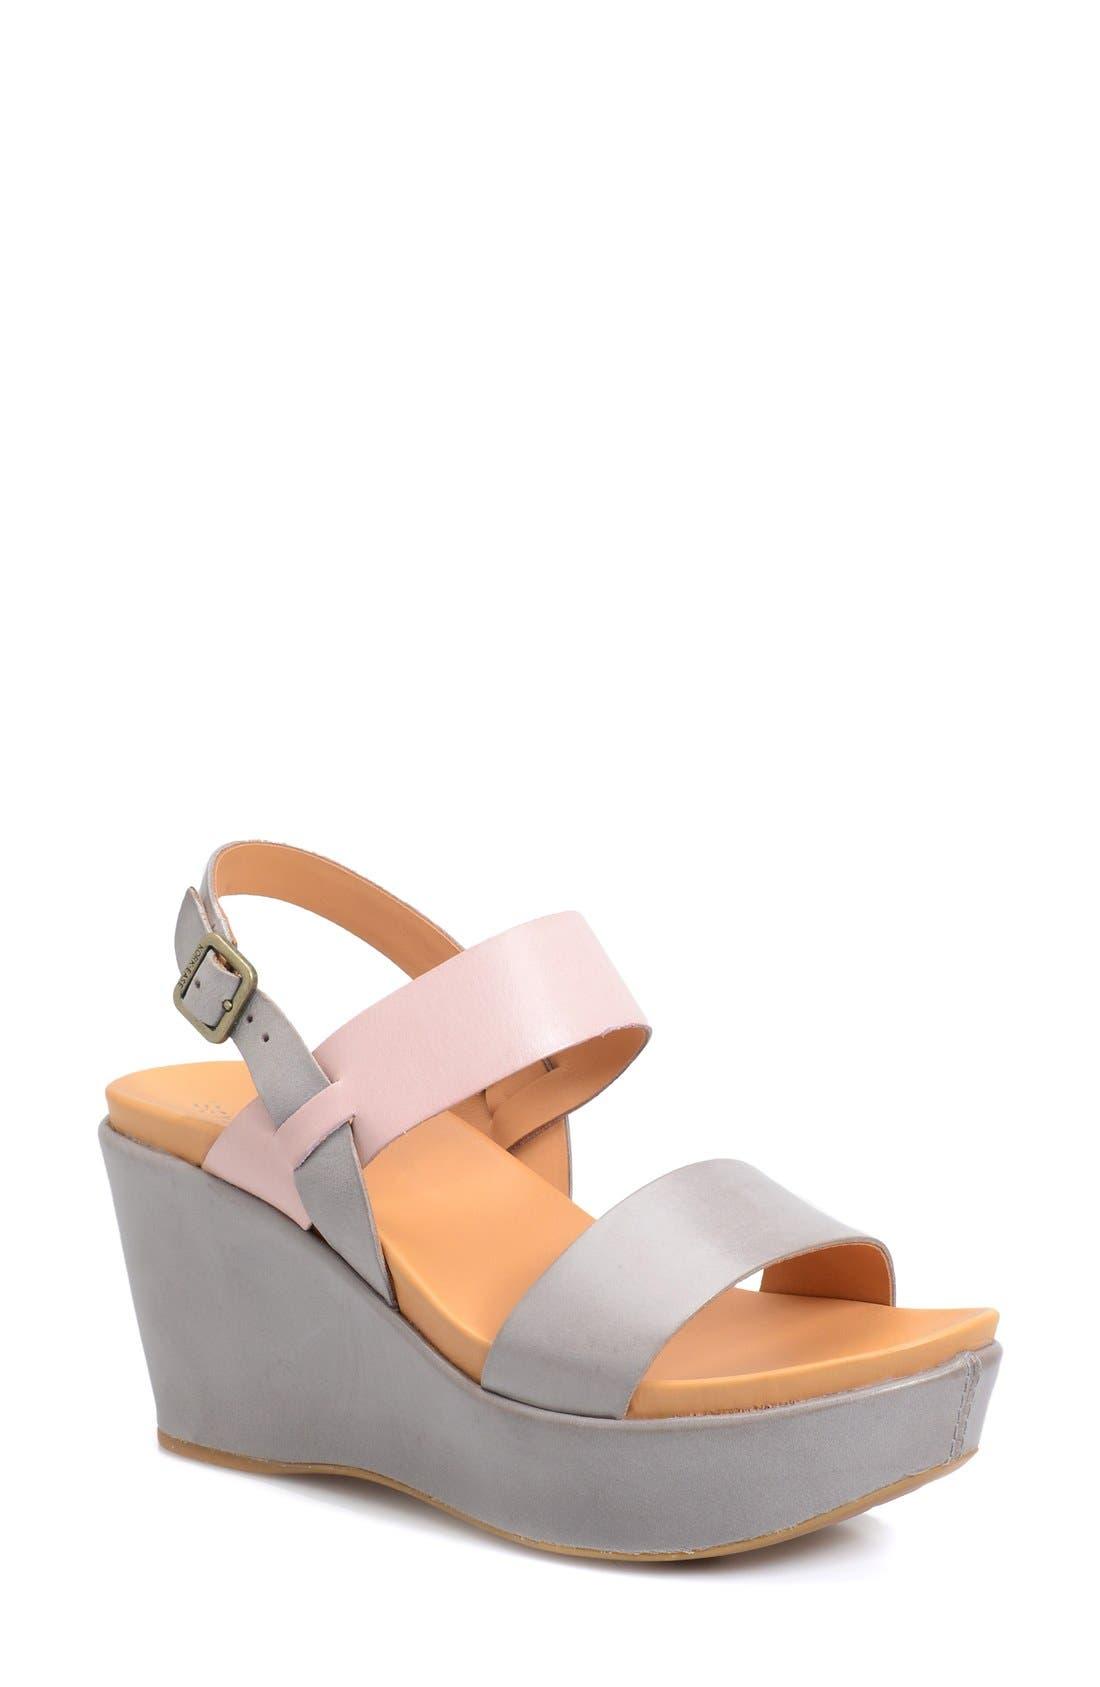 'Austin' Slingback Wedge Sandal,                             Main thumbnail 3, color,